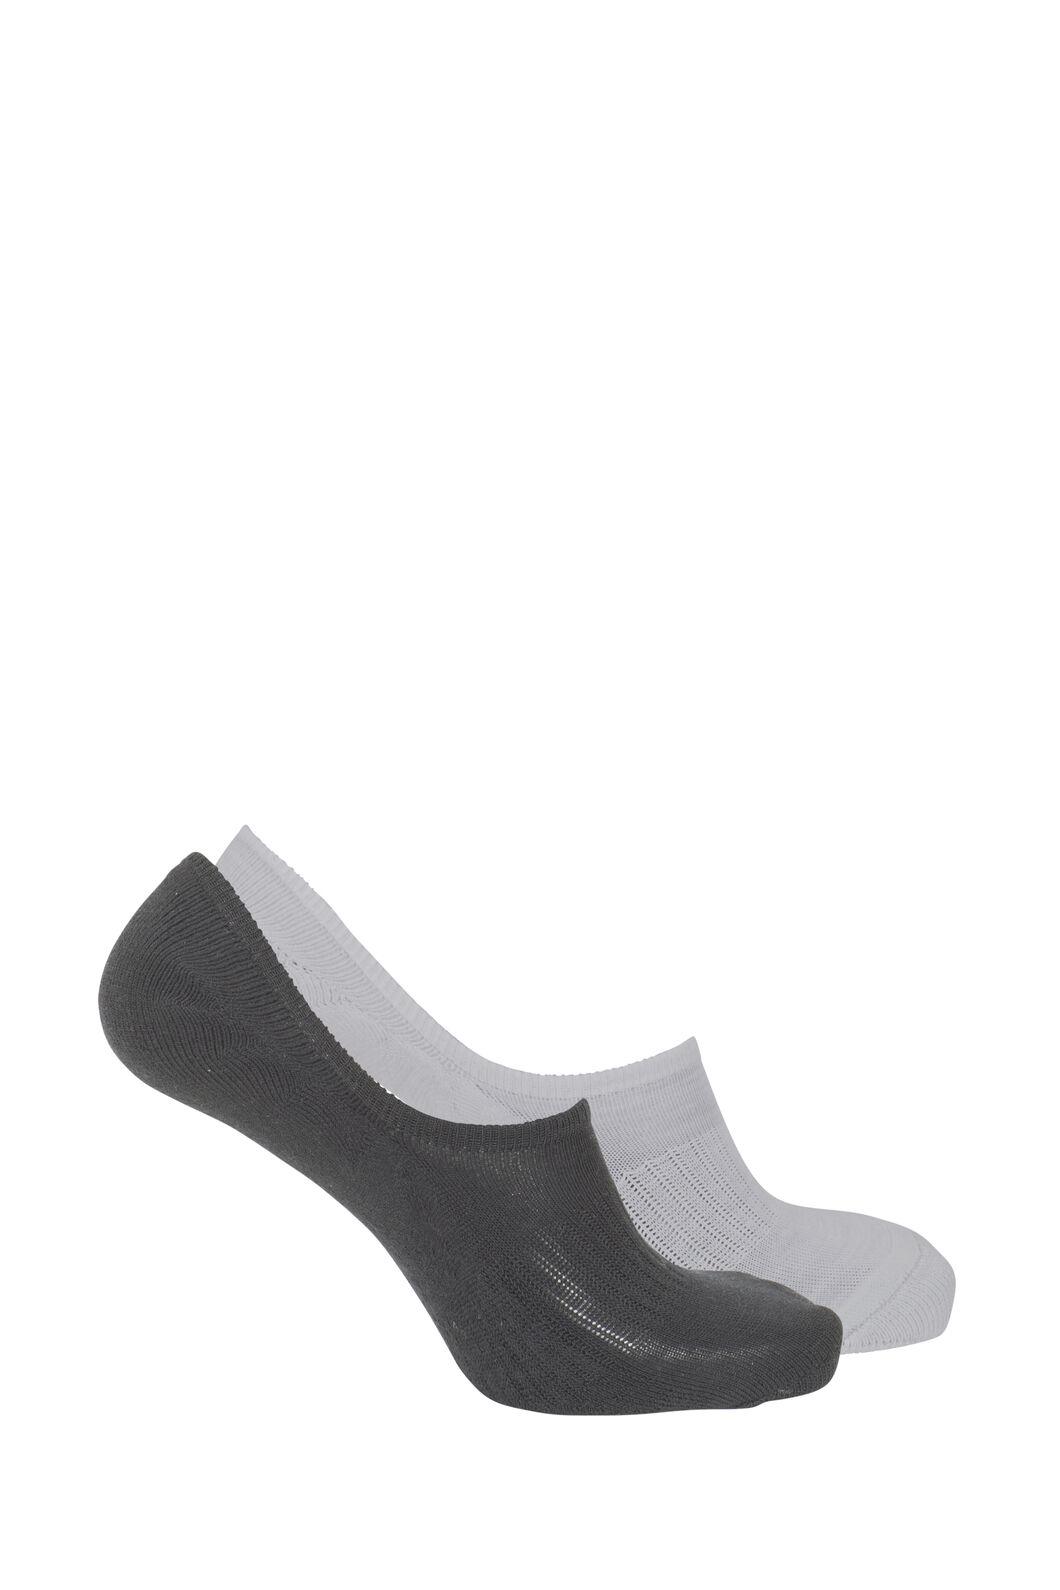 Macpac Invisible Merino Socks (2 Pack), Black/Grey Marle, hi-res